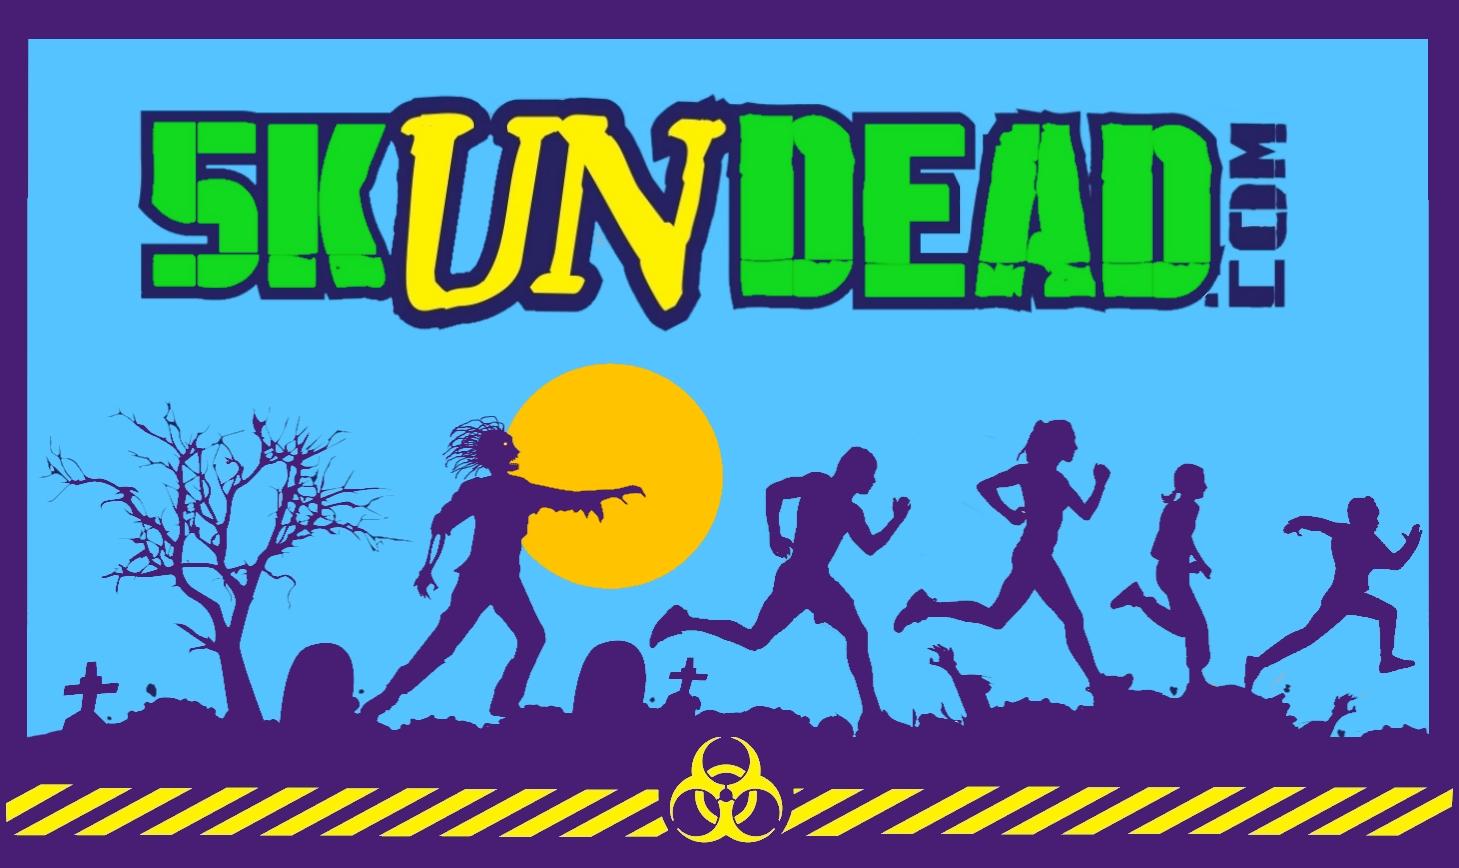 RaceThread.com 5KUnDead Zombie Run - Austin, TX